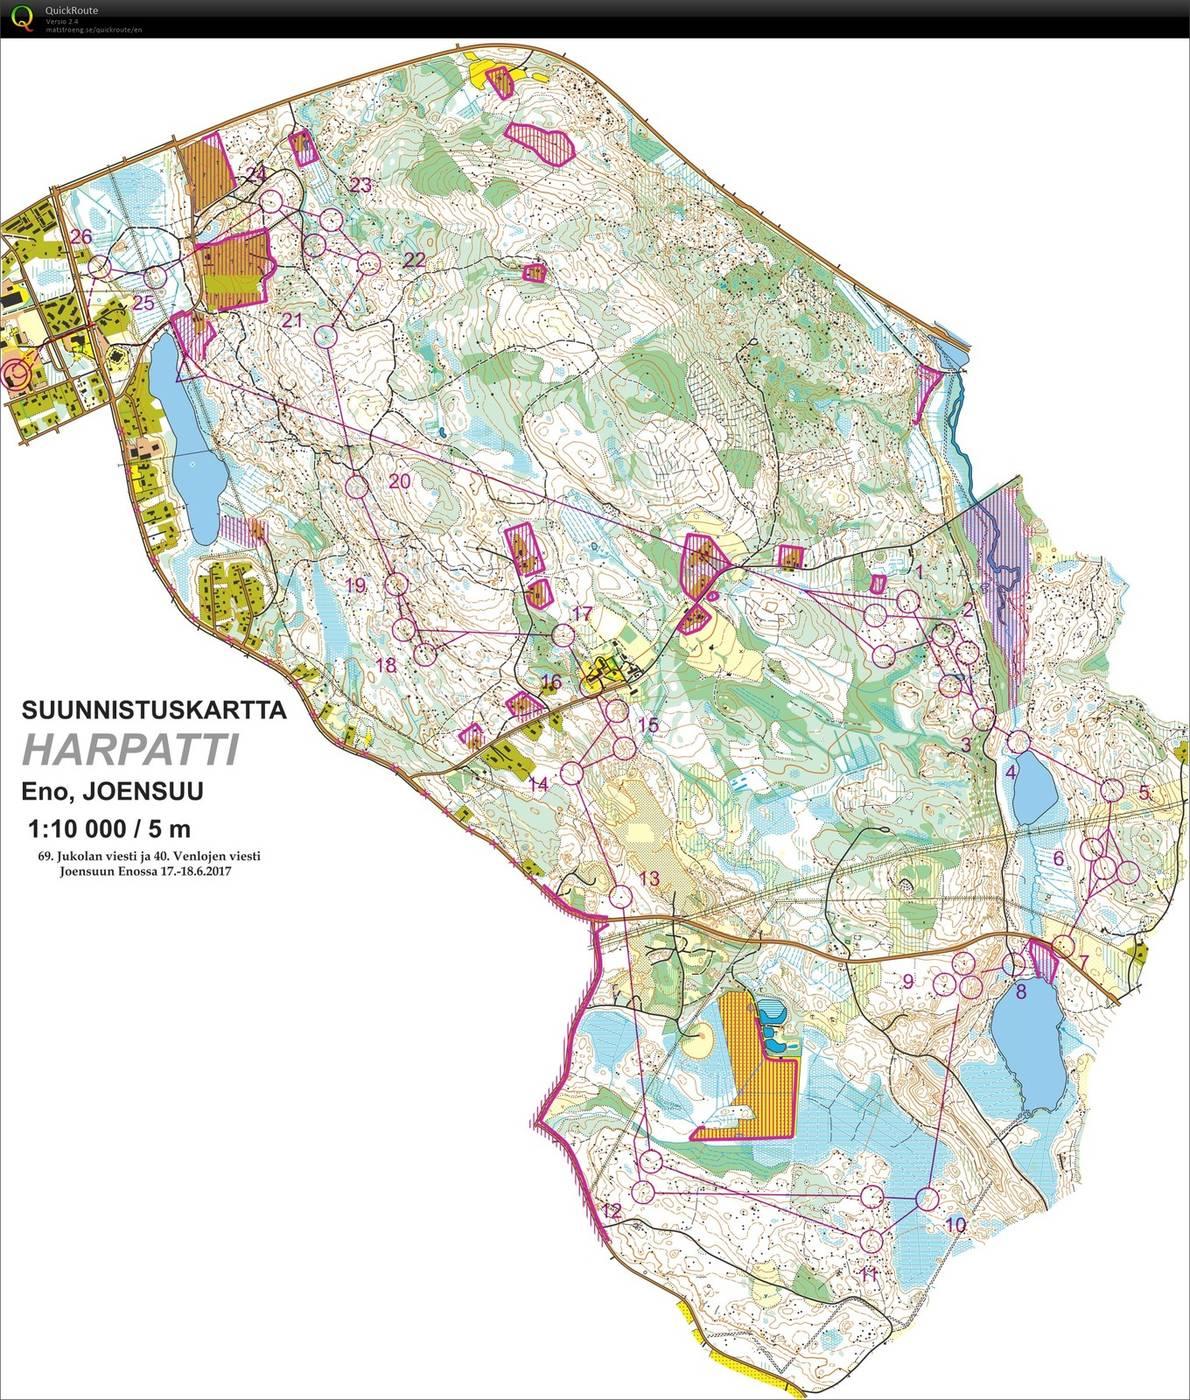 JoensuuJukola 3rd leg June 19th 2017 Orienteering Map from Atte